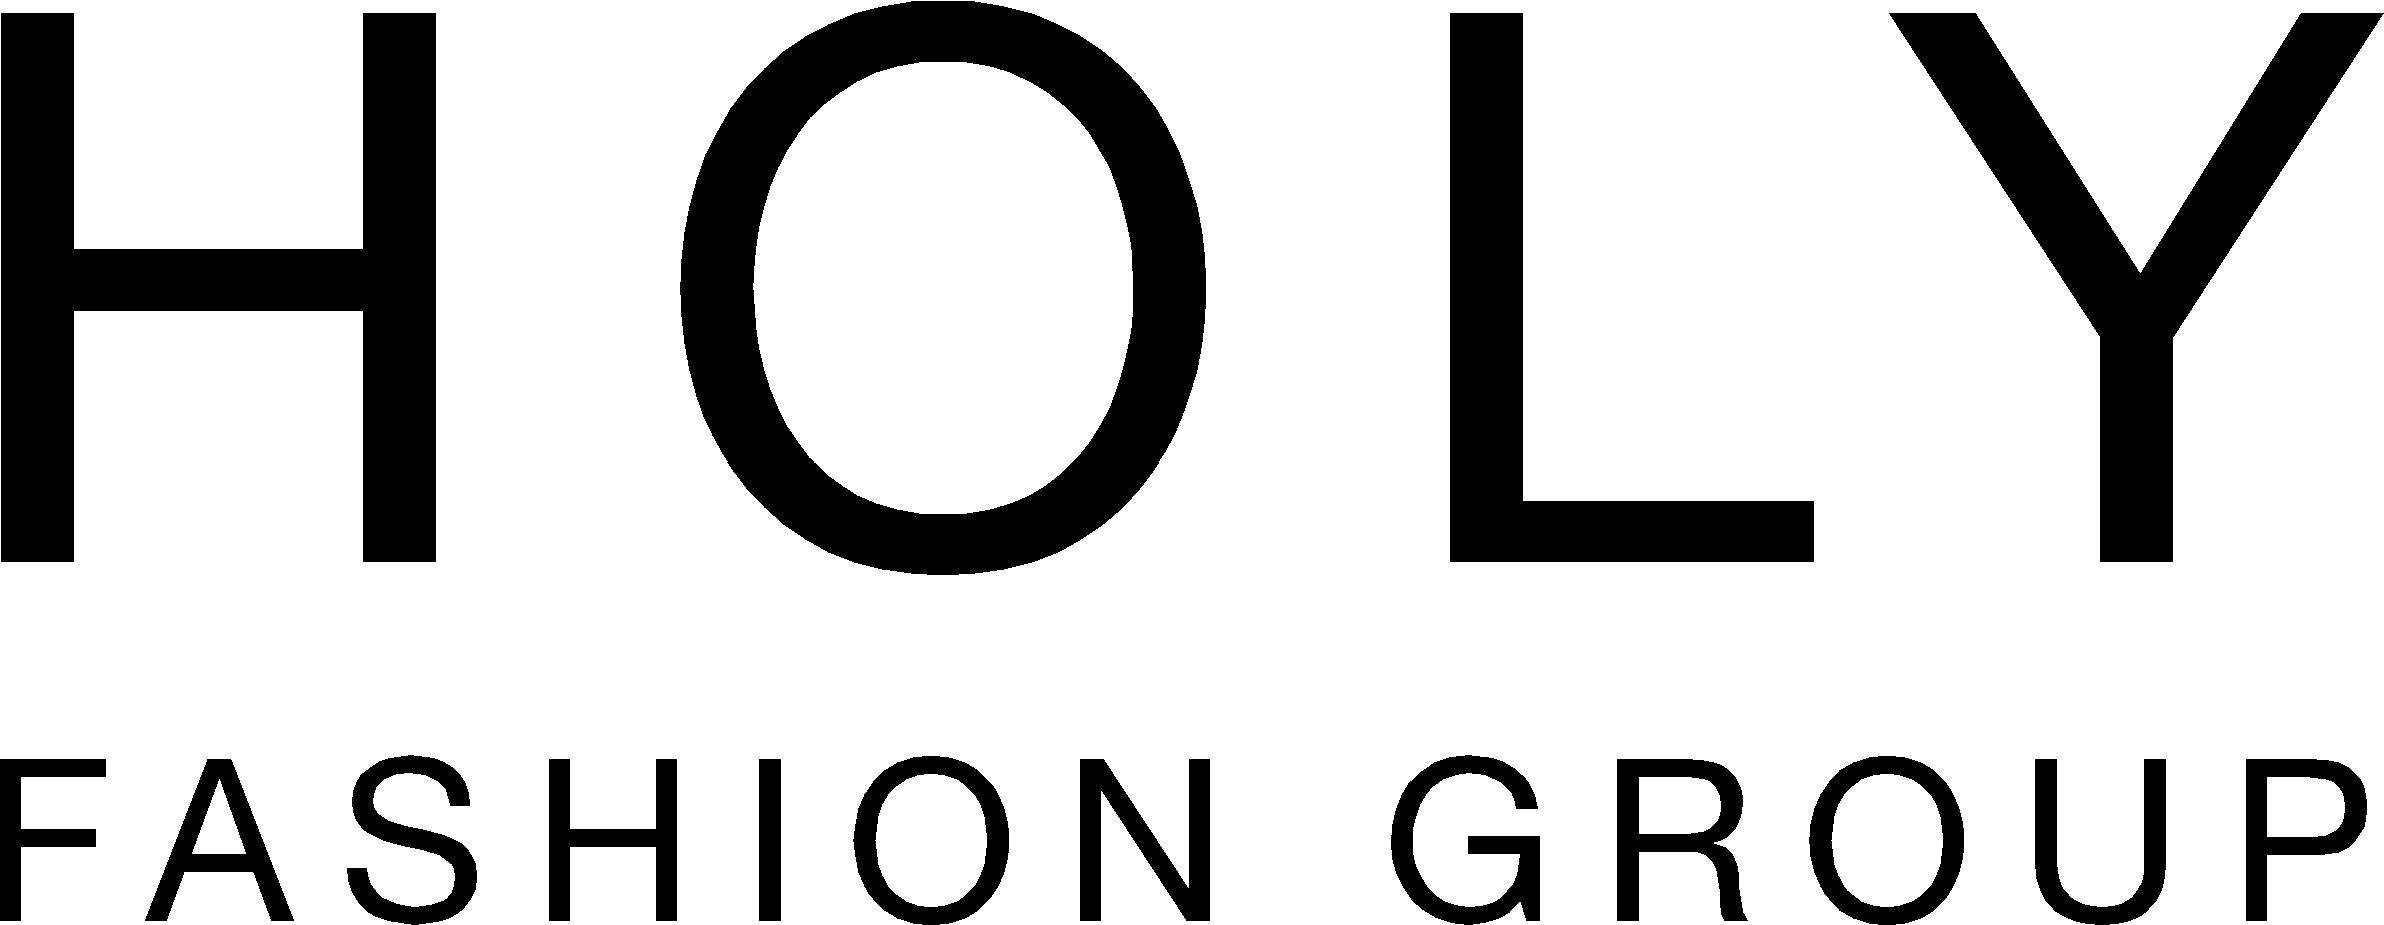 Holy Fashion Group